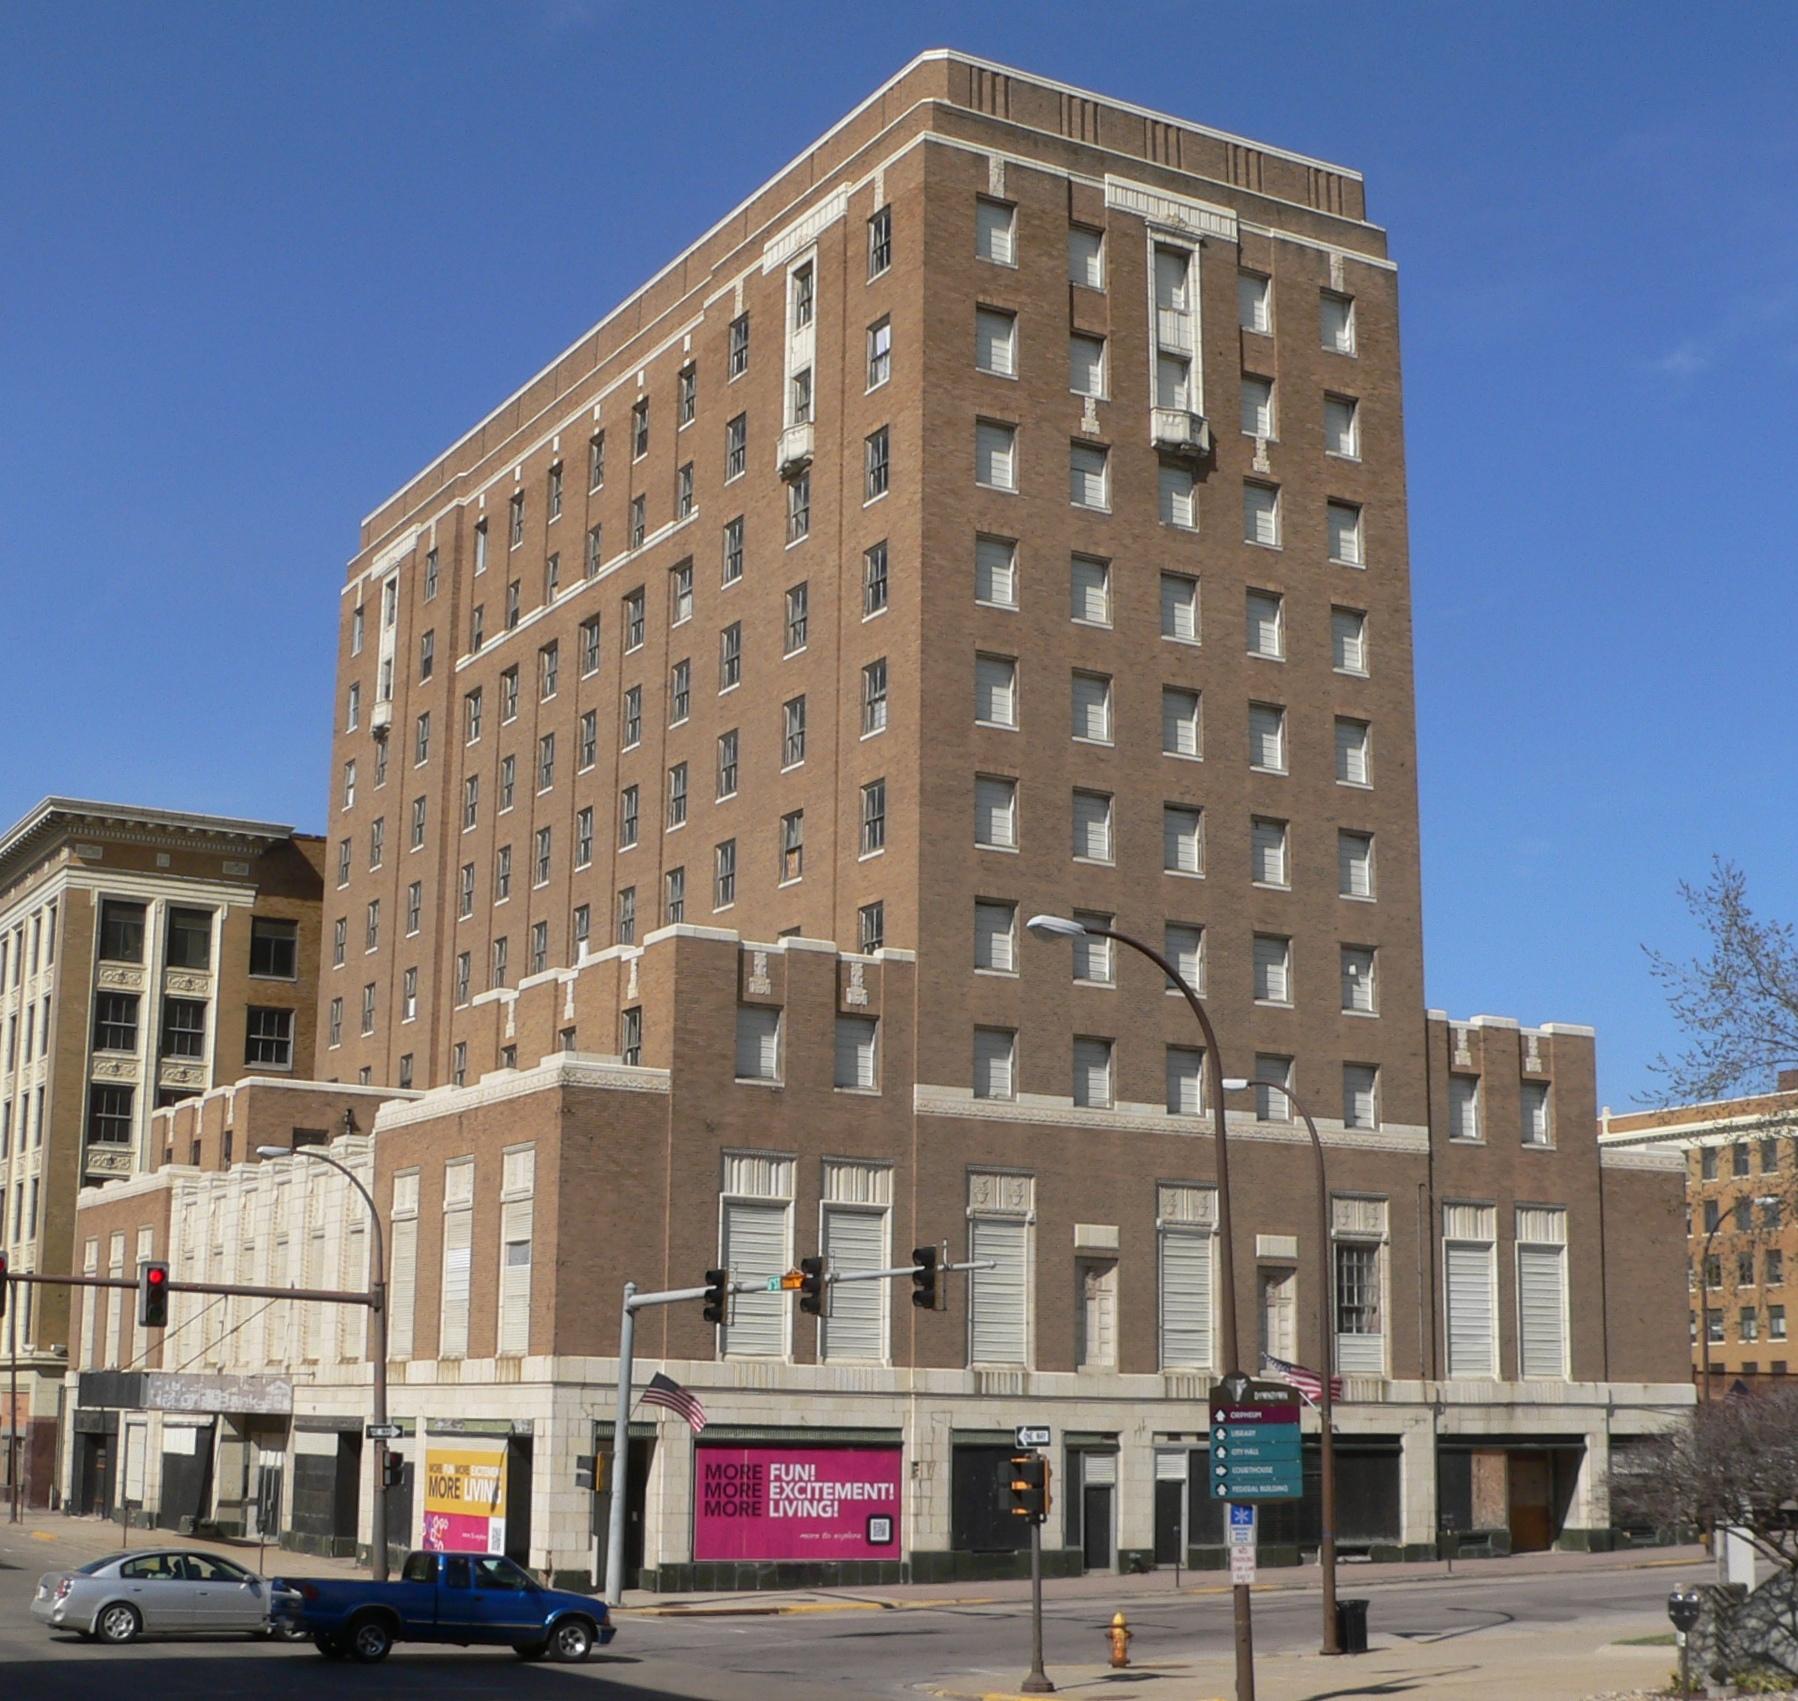 File:Warrior Hotel (Siouxwarrior city